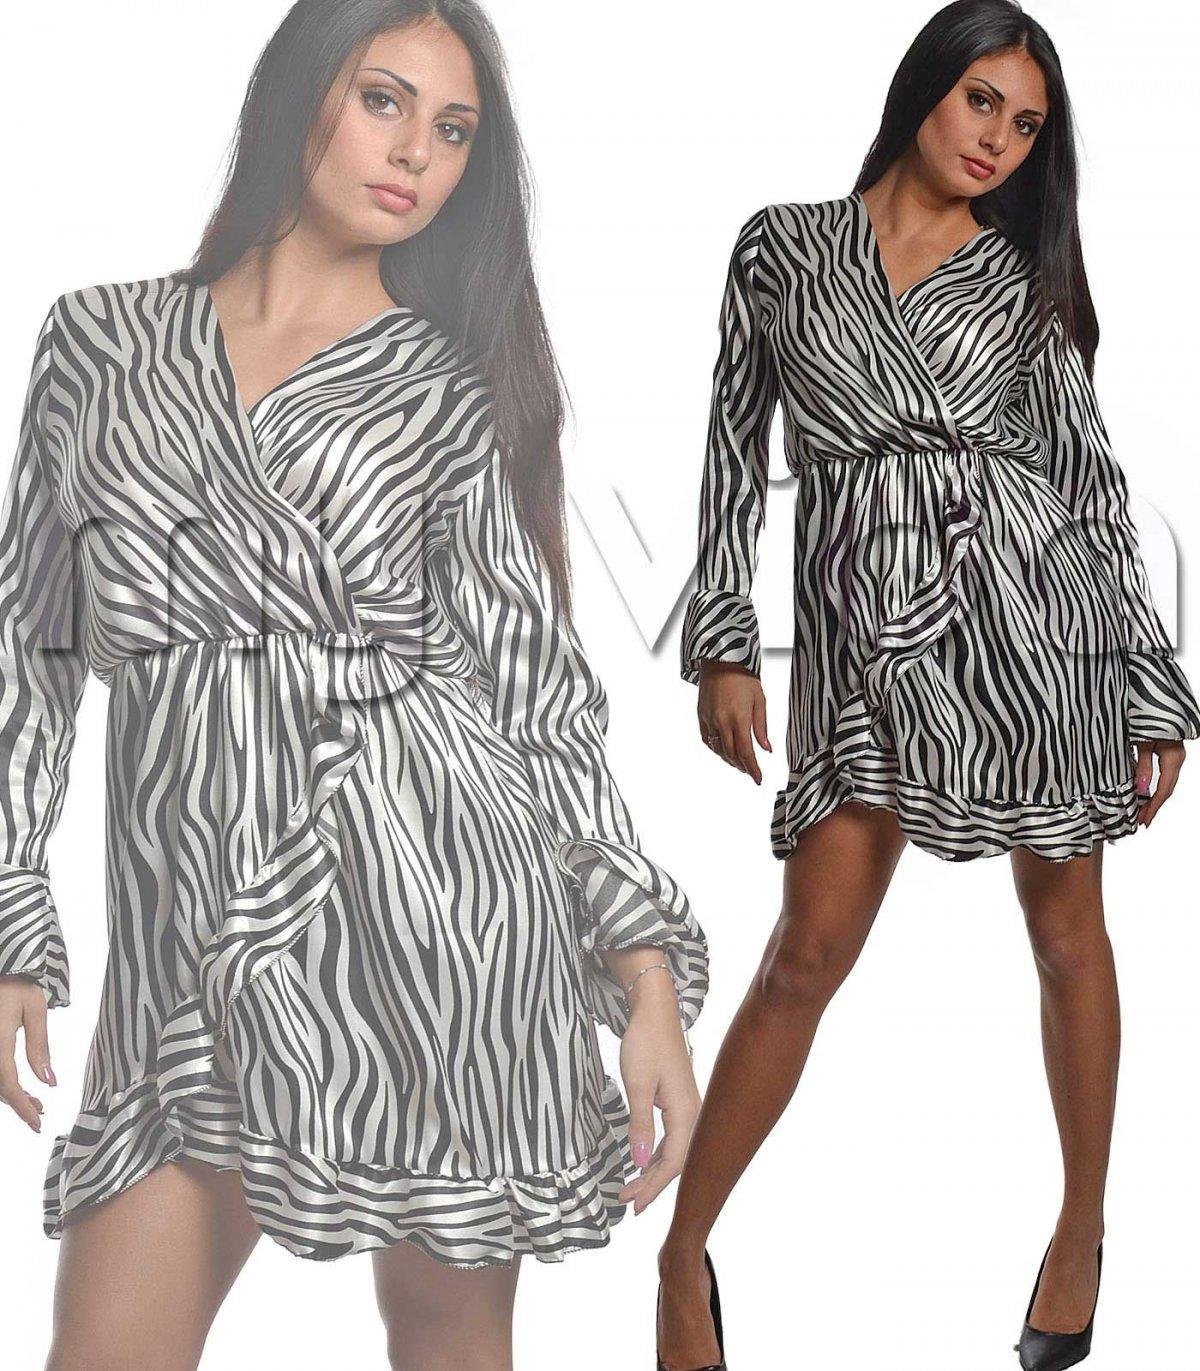 super popular 5f1b0 20c50 Vestito zebrato donna cintura vita maniche balze | My Vida